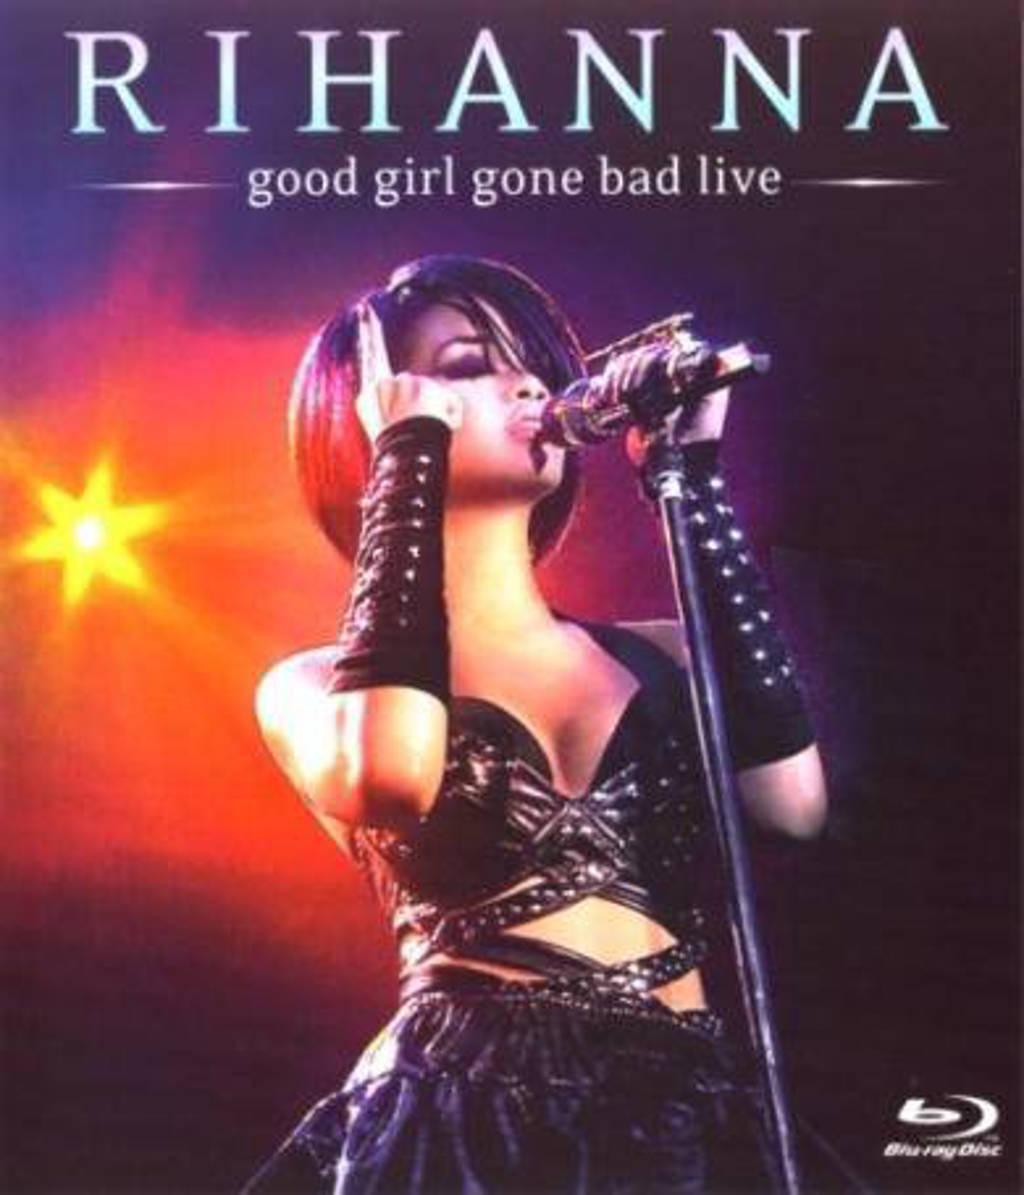 Rihanna - Good girl gone bad live (Blu-ray)